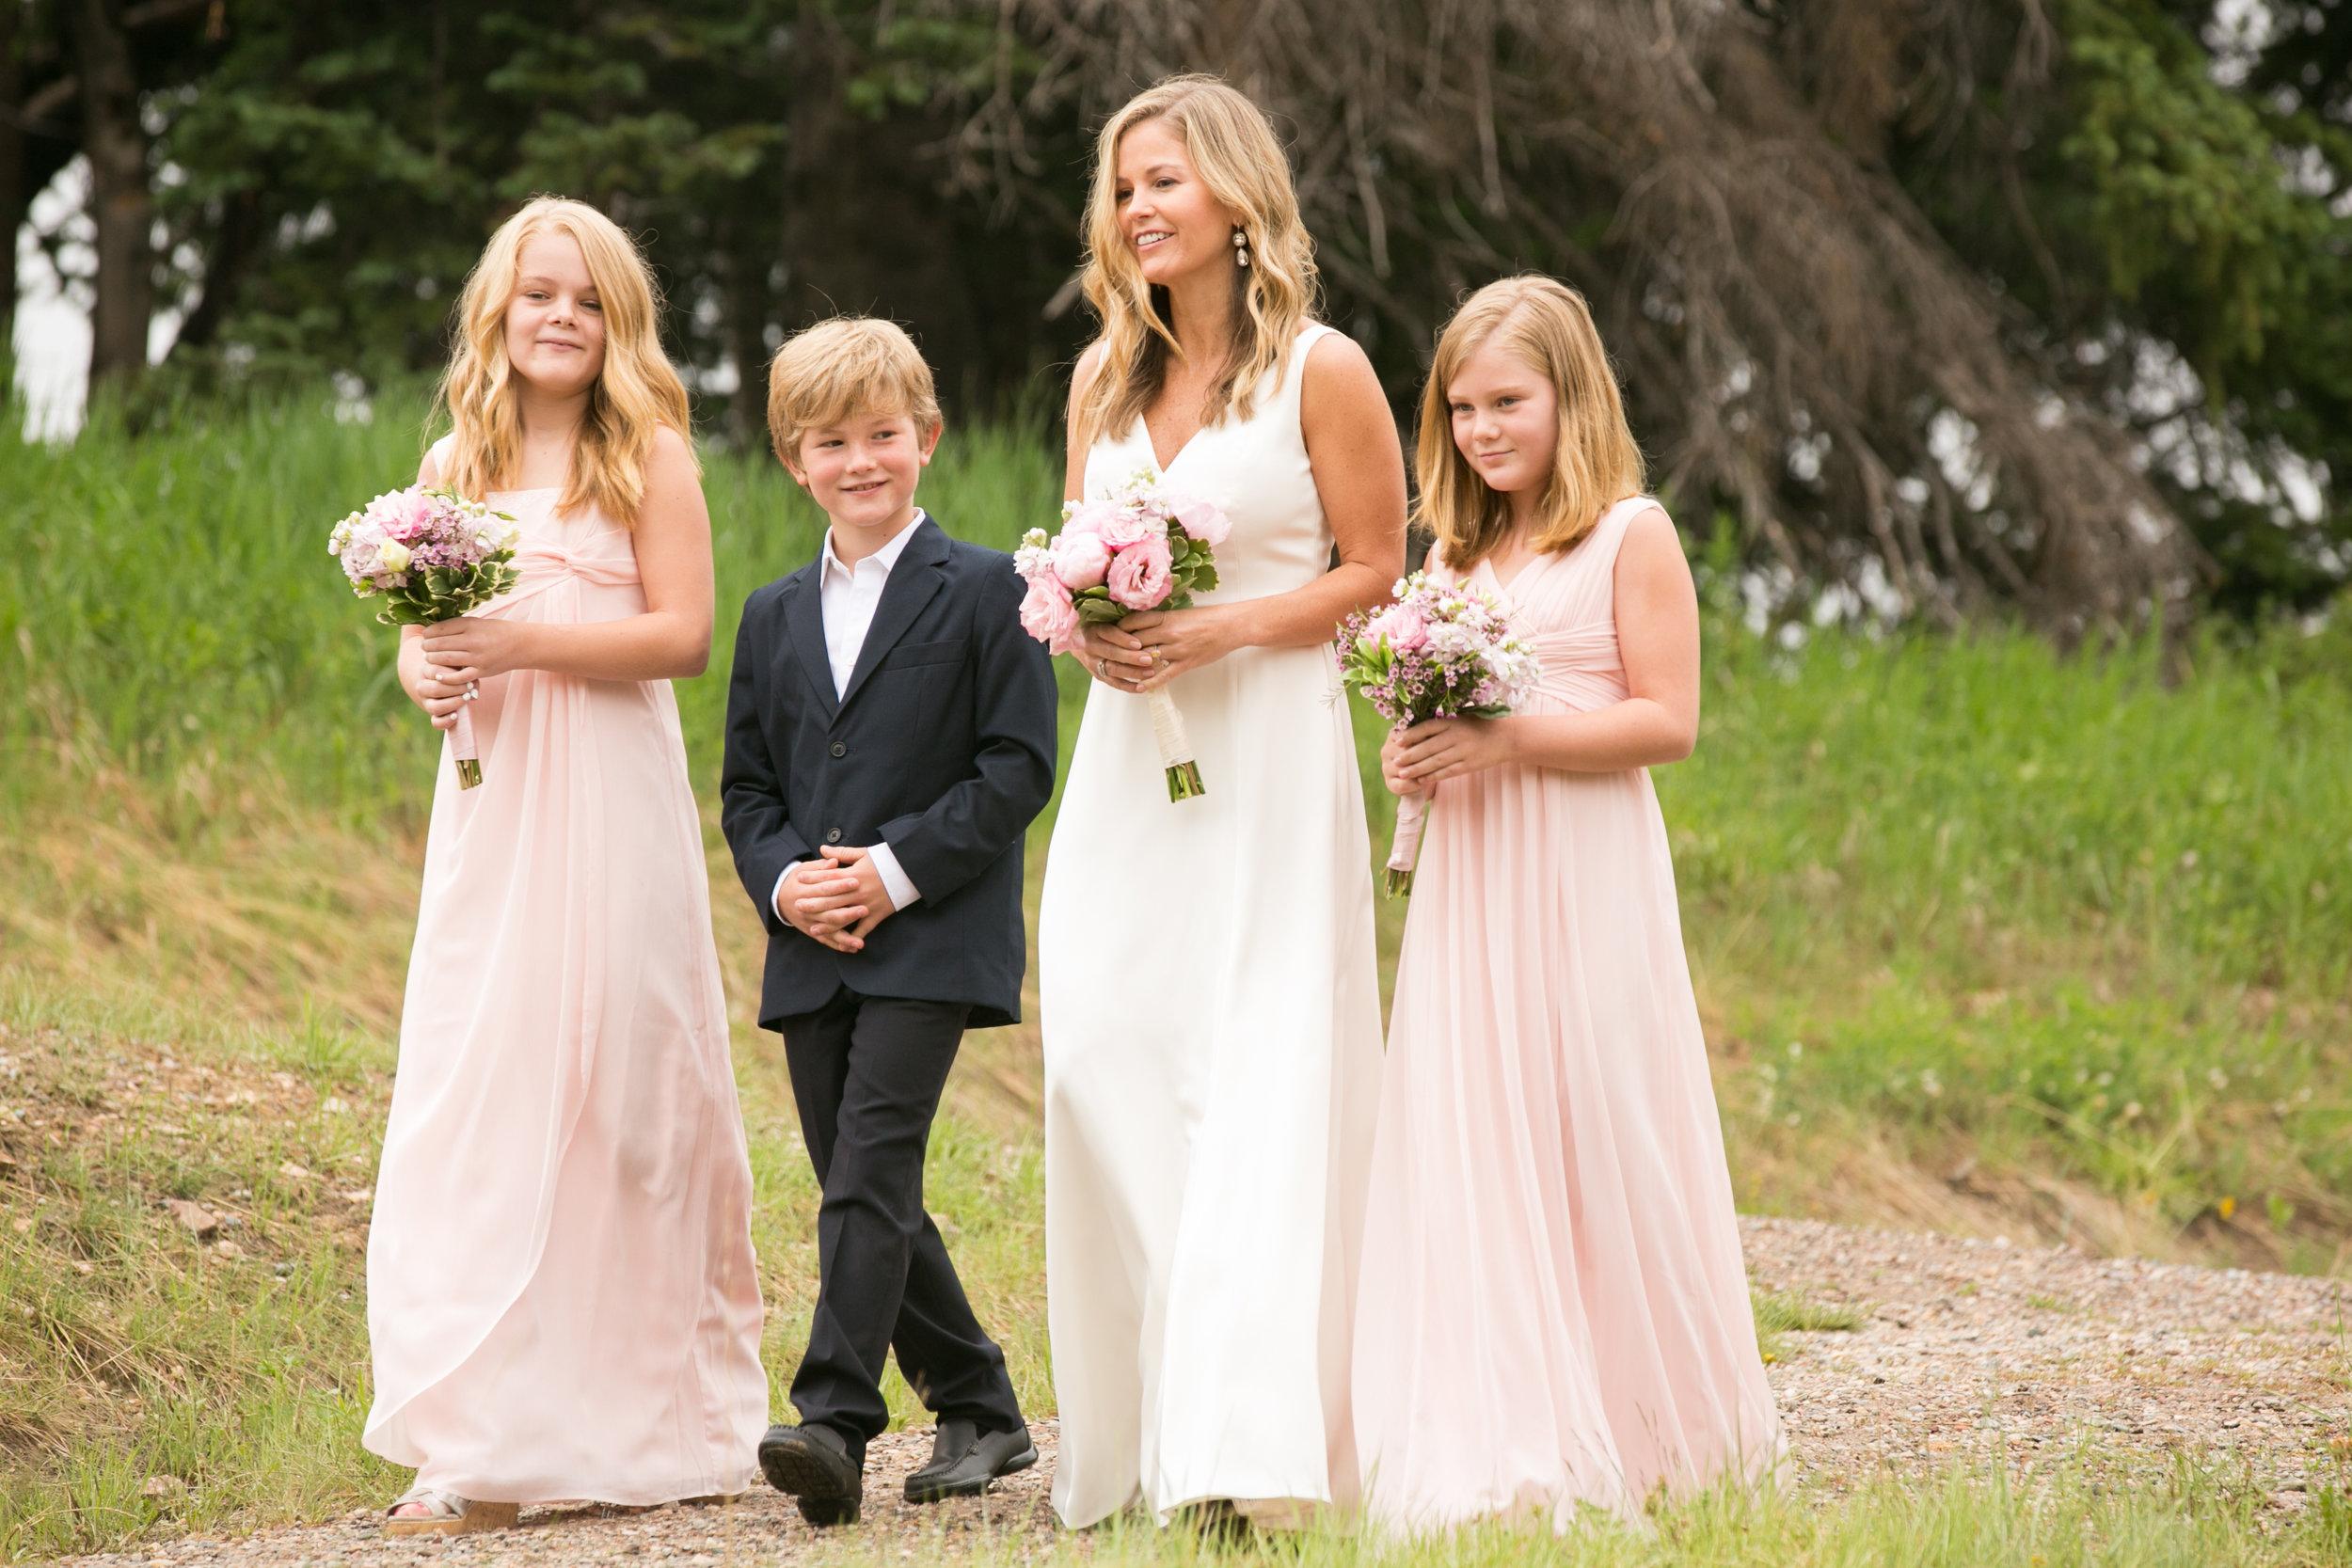 Beaver Creek Wedding Deck with Photographer Toni Axelrod